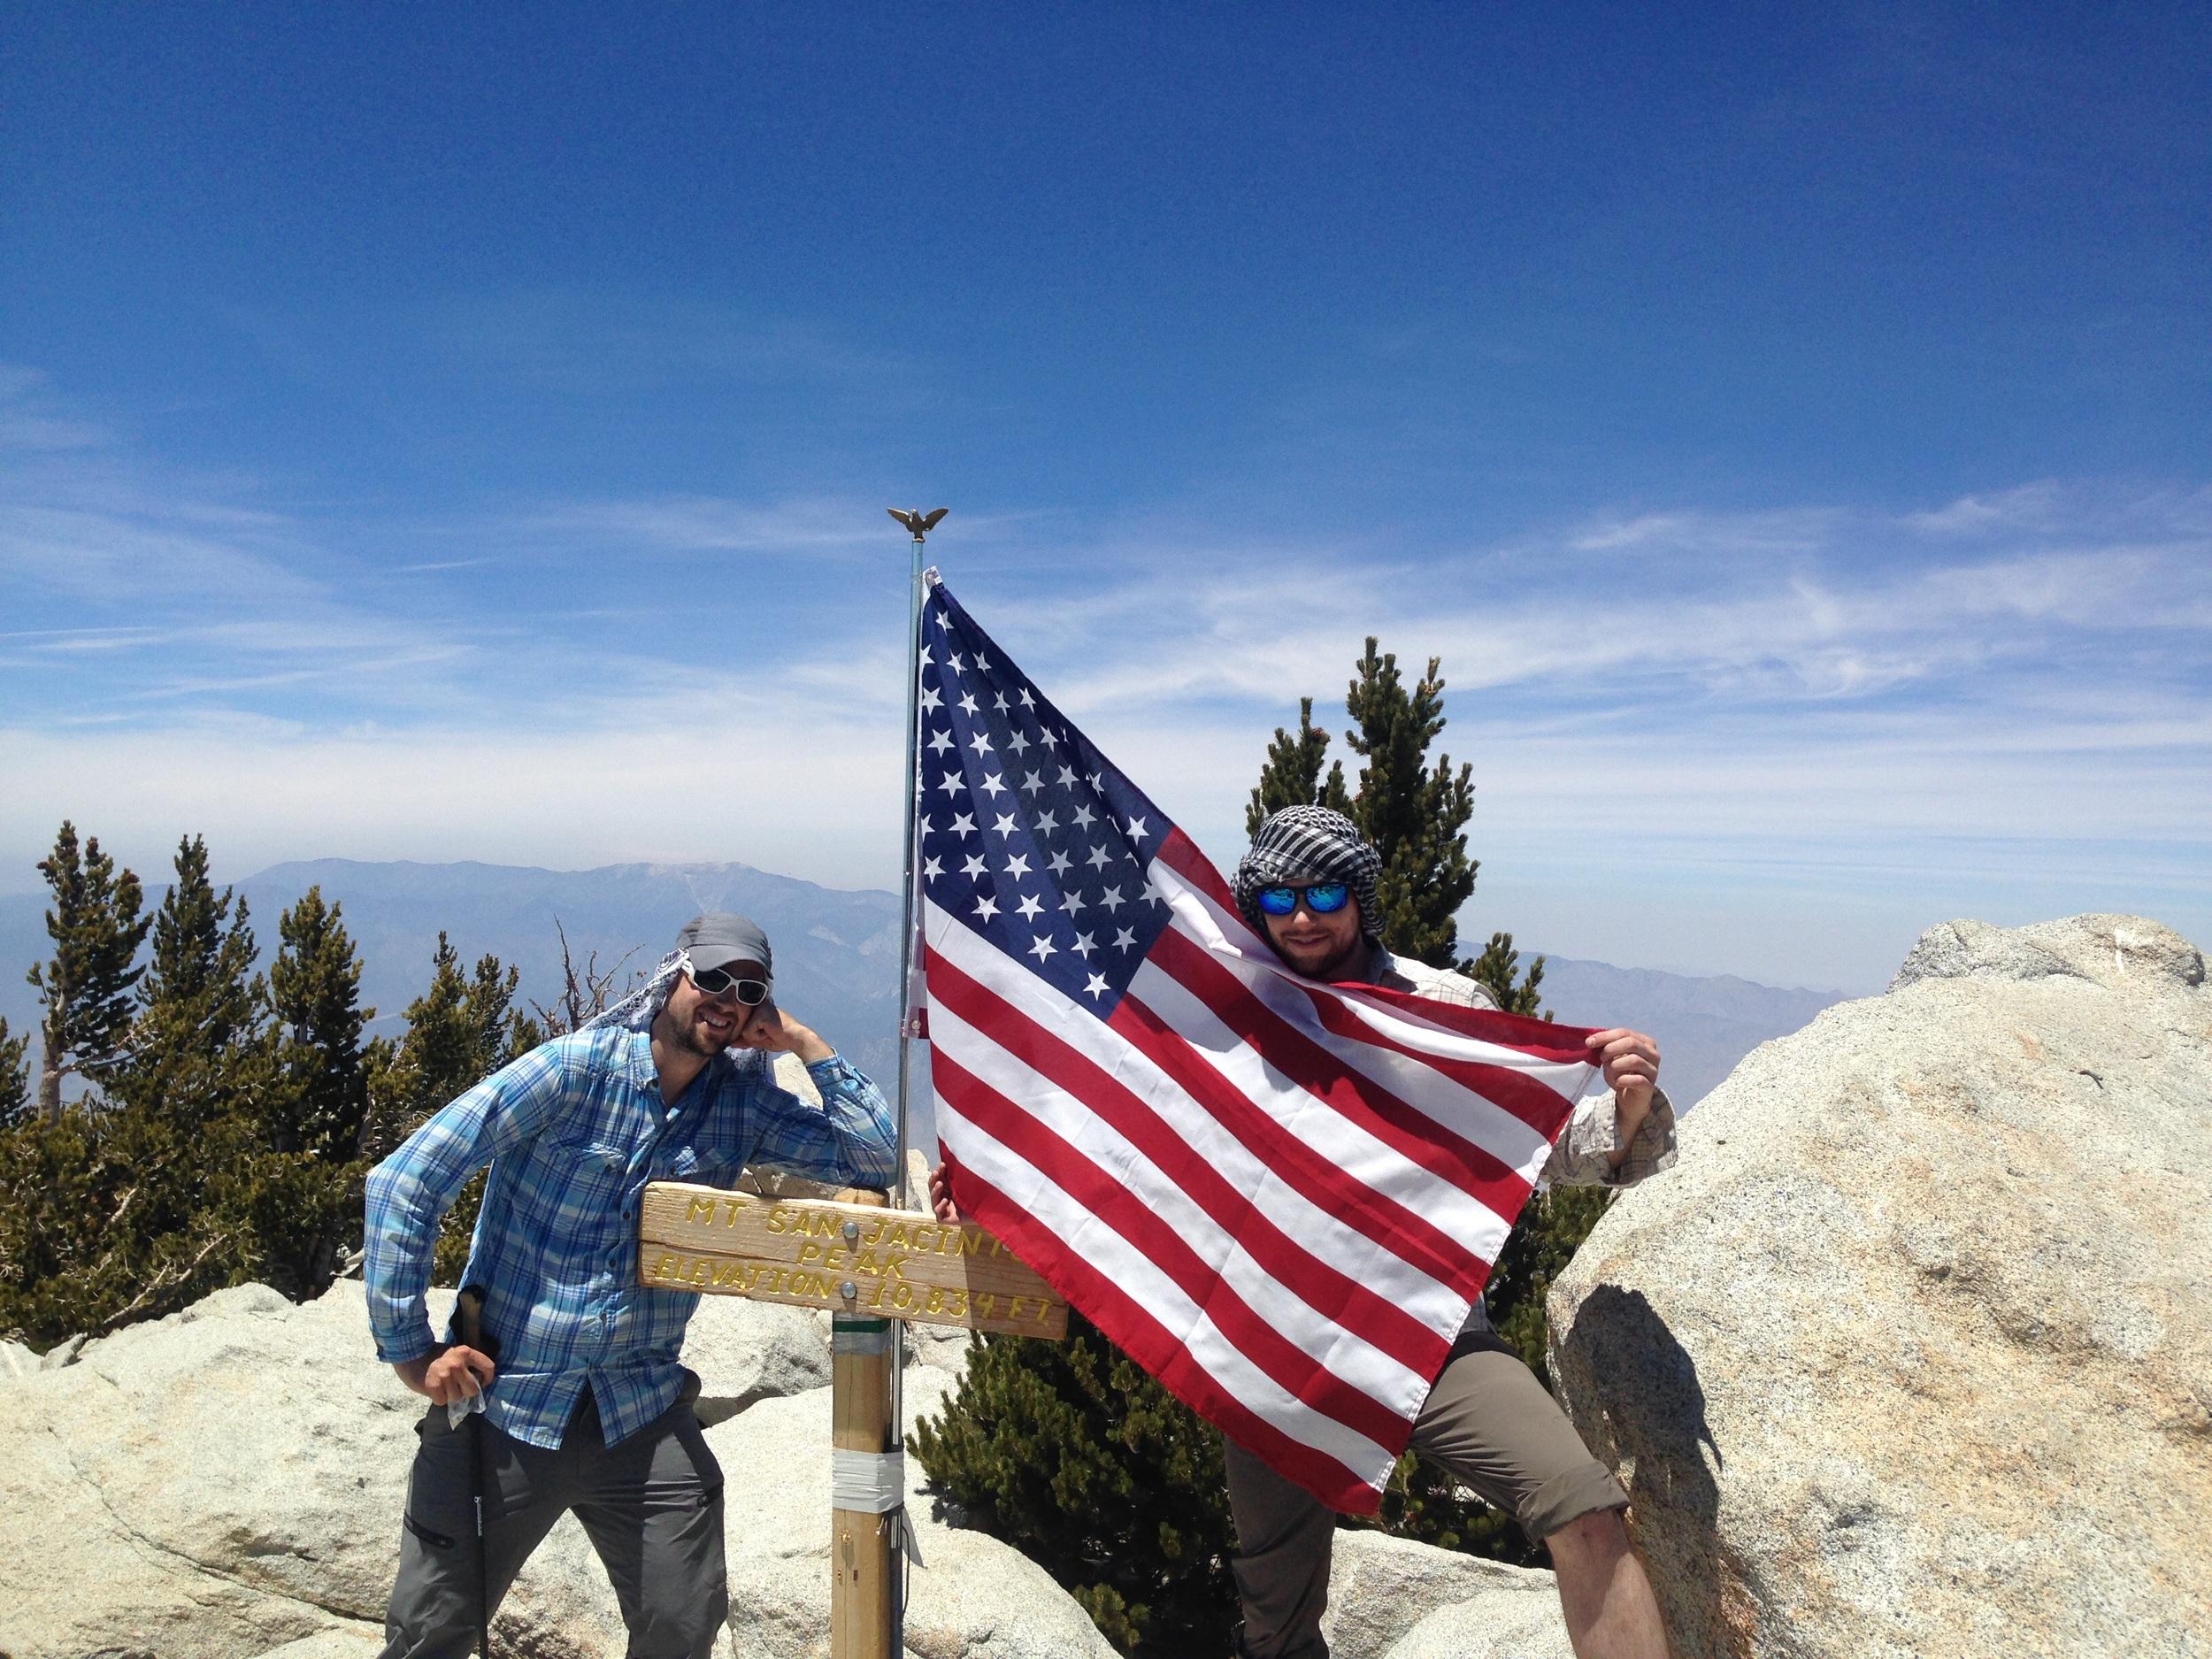 Chris and Ben on the summit of San Jacinto